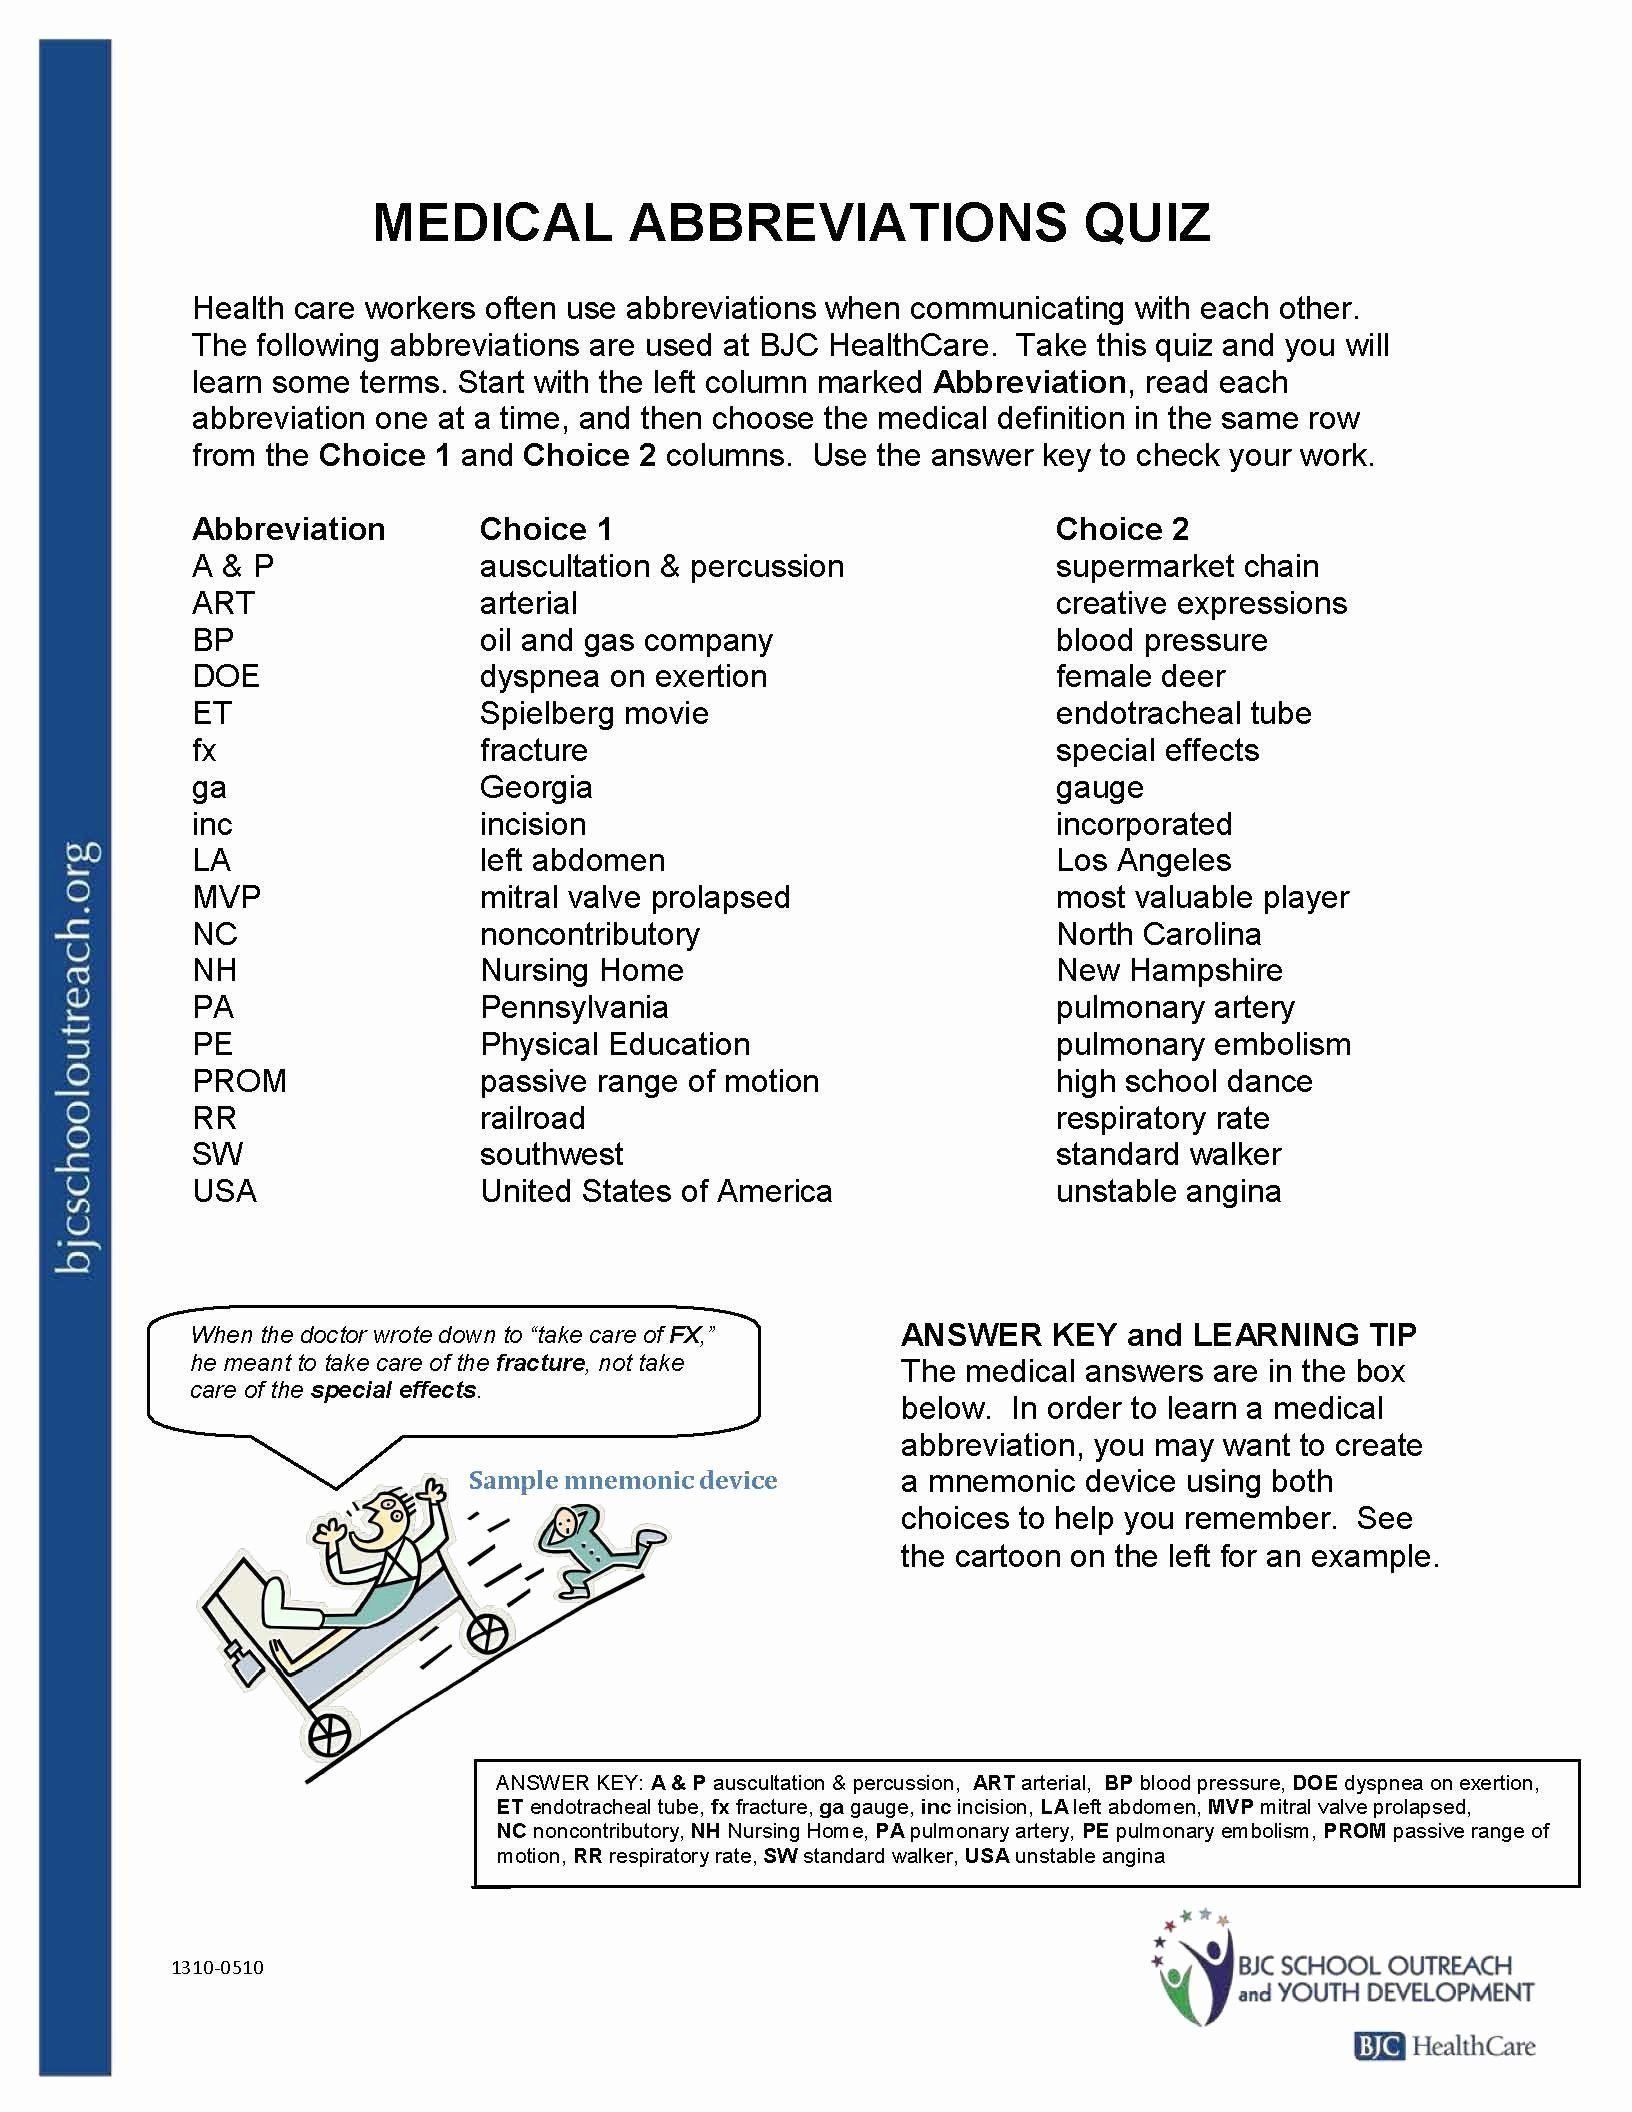 Medical Terminology Abbreviations Worksheet 50 Medical Terminology Abbreviations Worksheet In 2020 Word Family Worksheets Word Families Family Worksheet